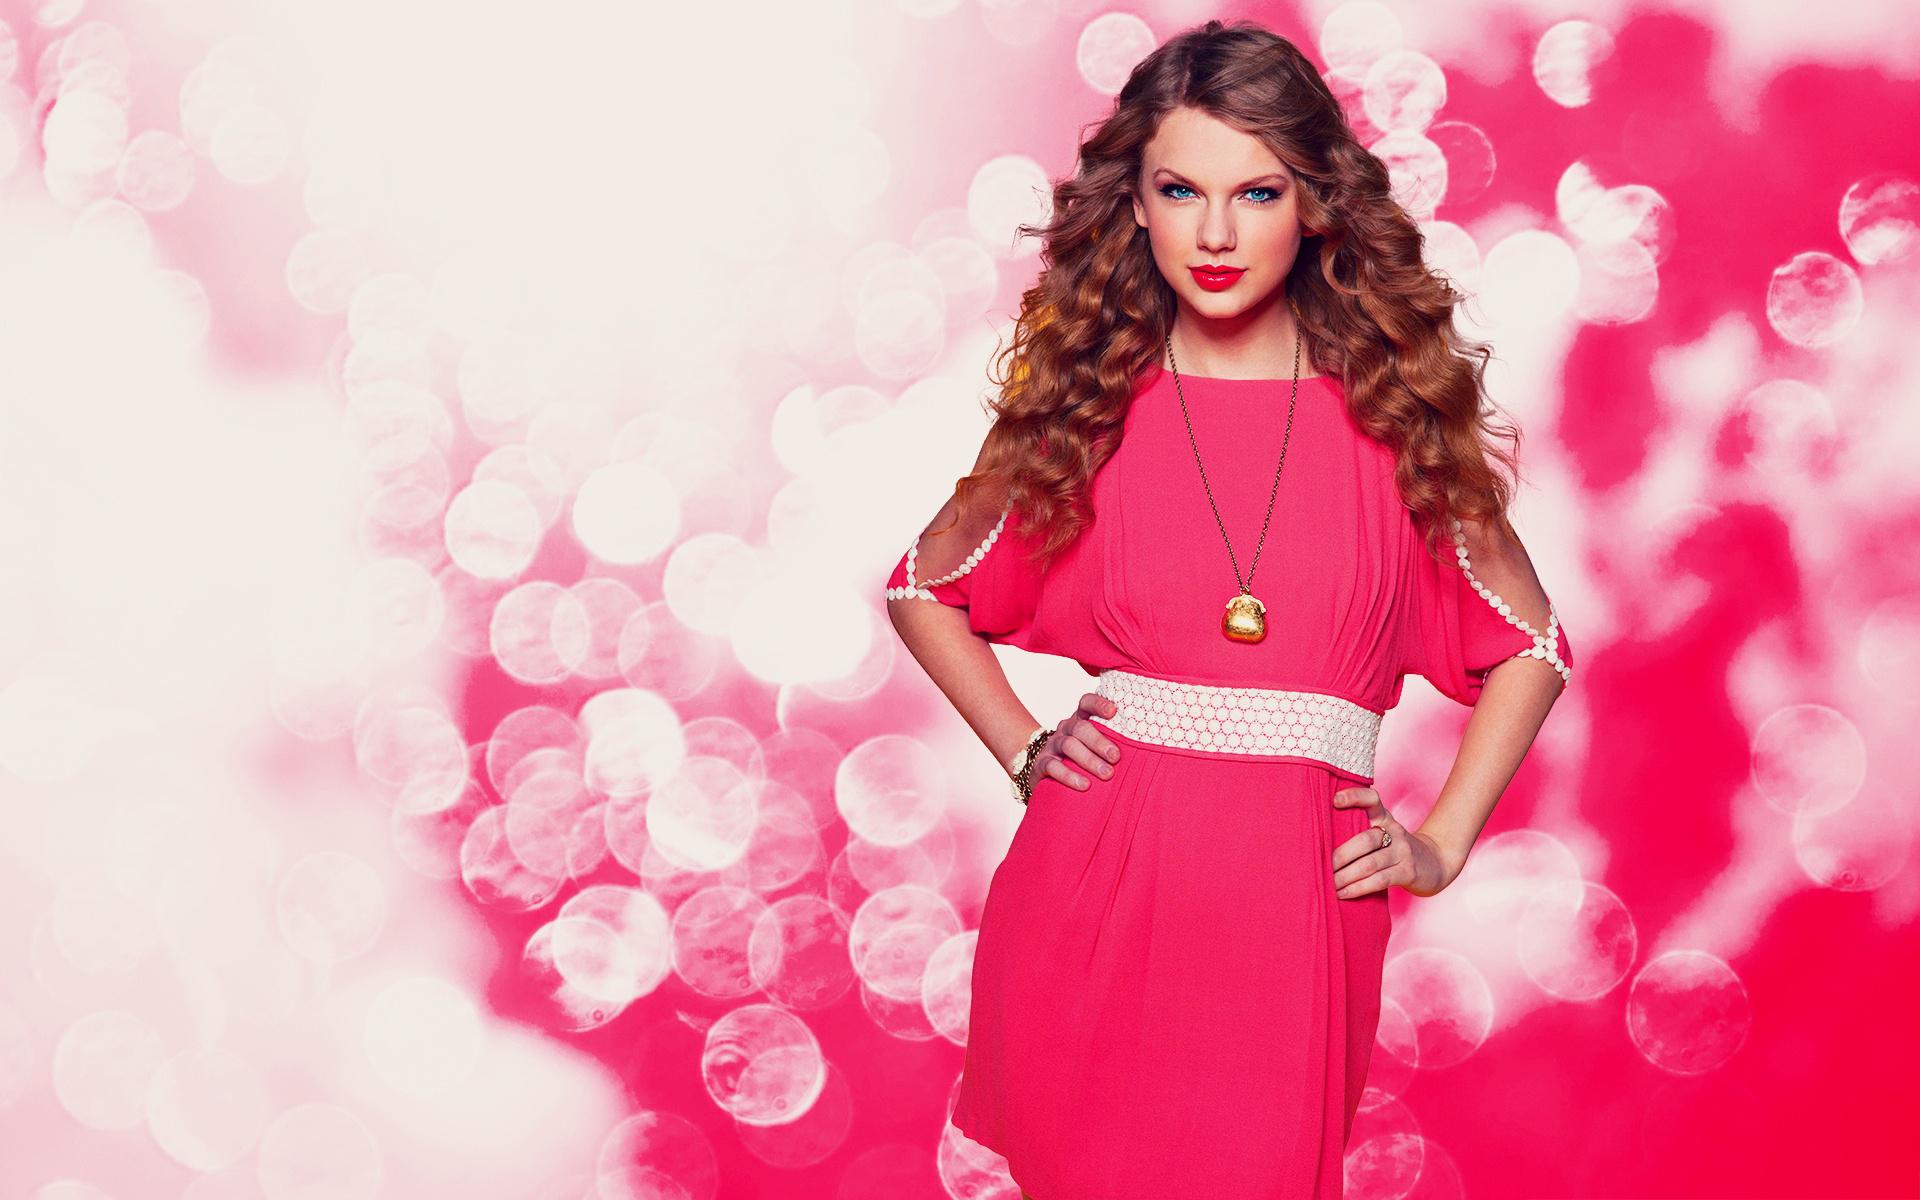 Pink Style Taylor Swift - Pink Style Taylor Swift